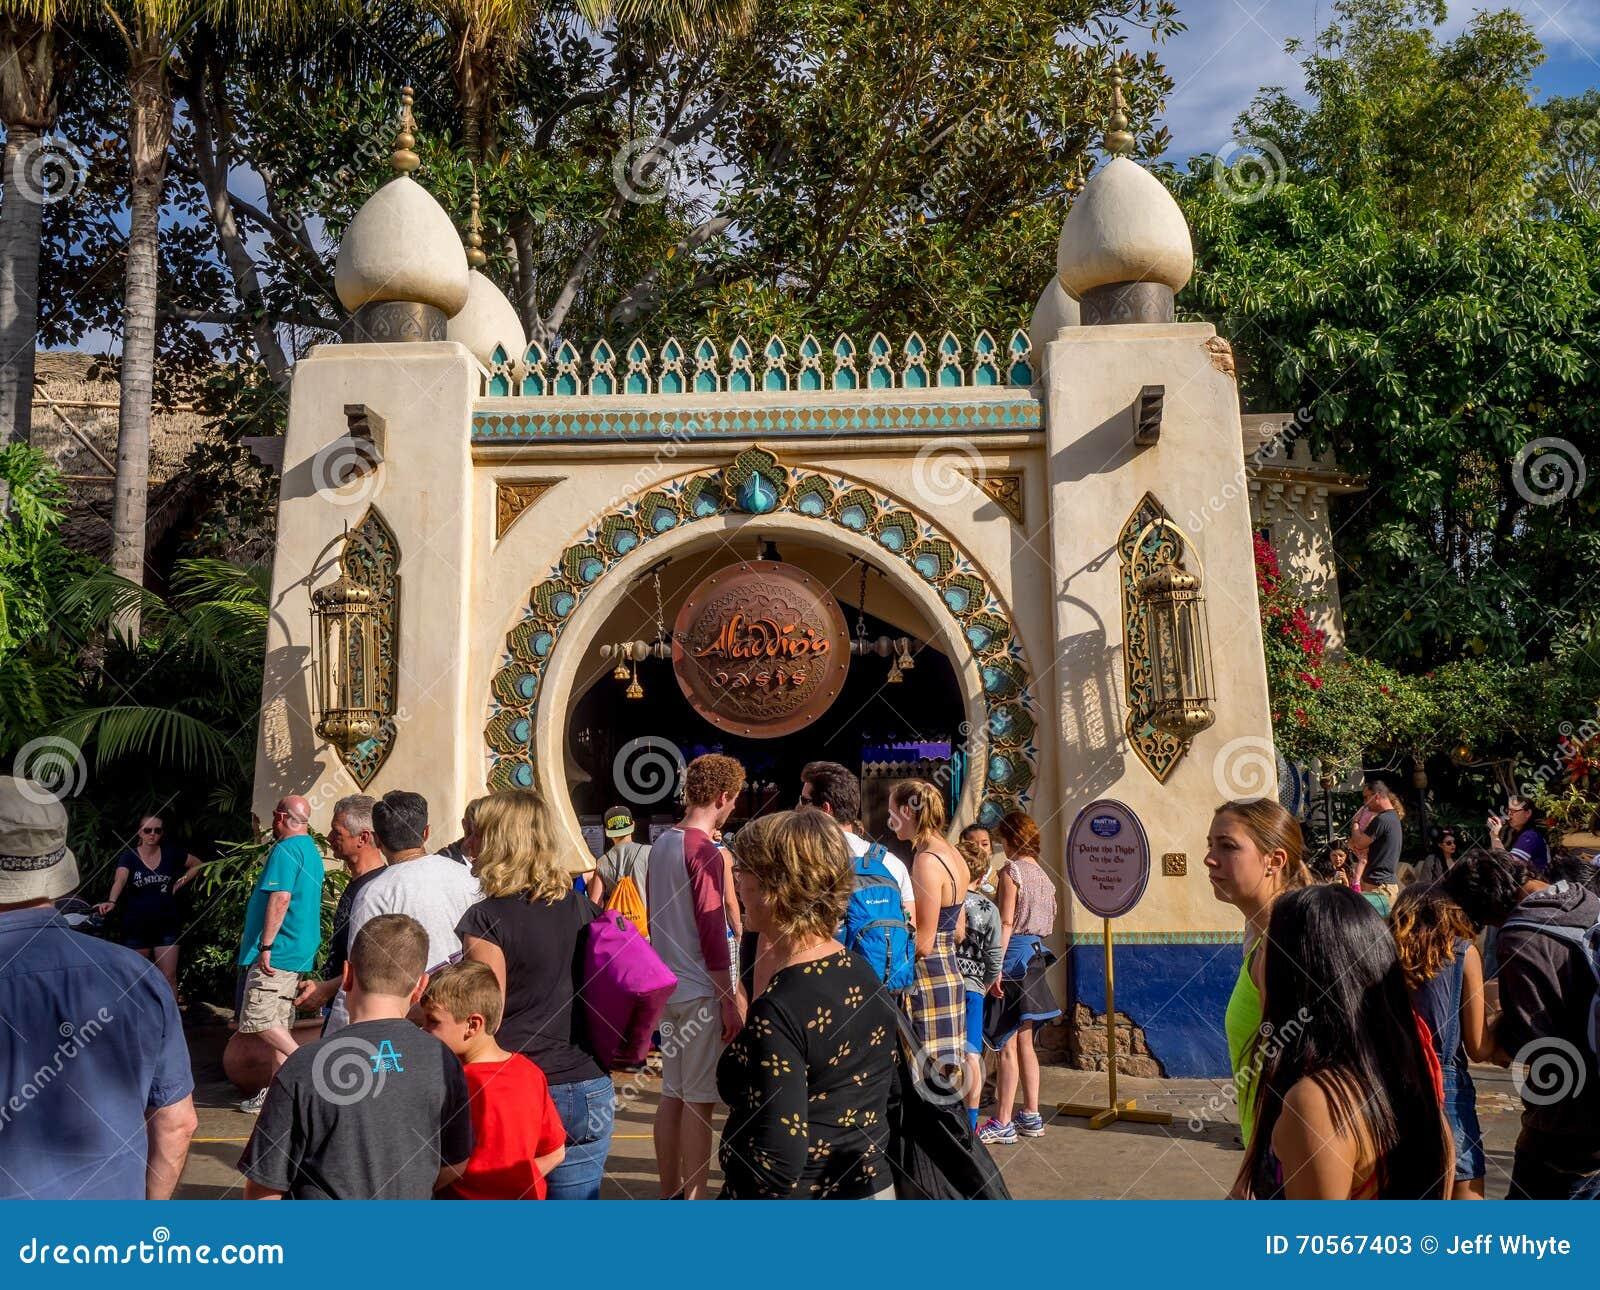 Crowds In Adventureland At Disneyland Park Editorial Stock